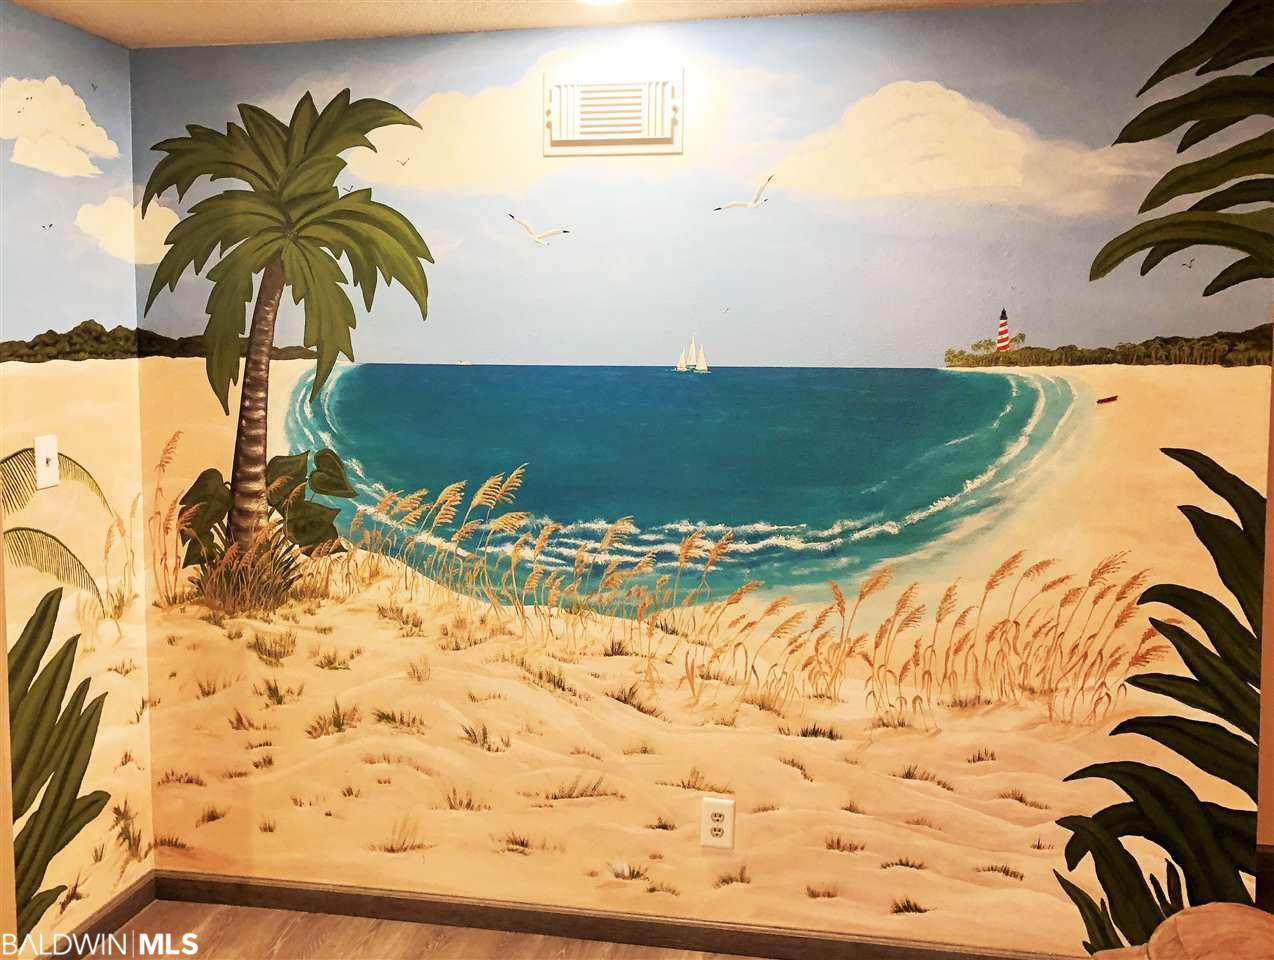 4170 Spinnaker Dr #1222A, Gulf Shores, AL 36542